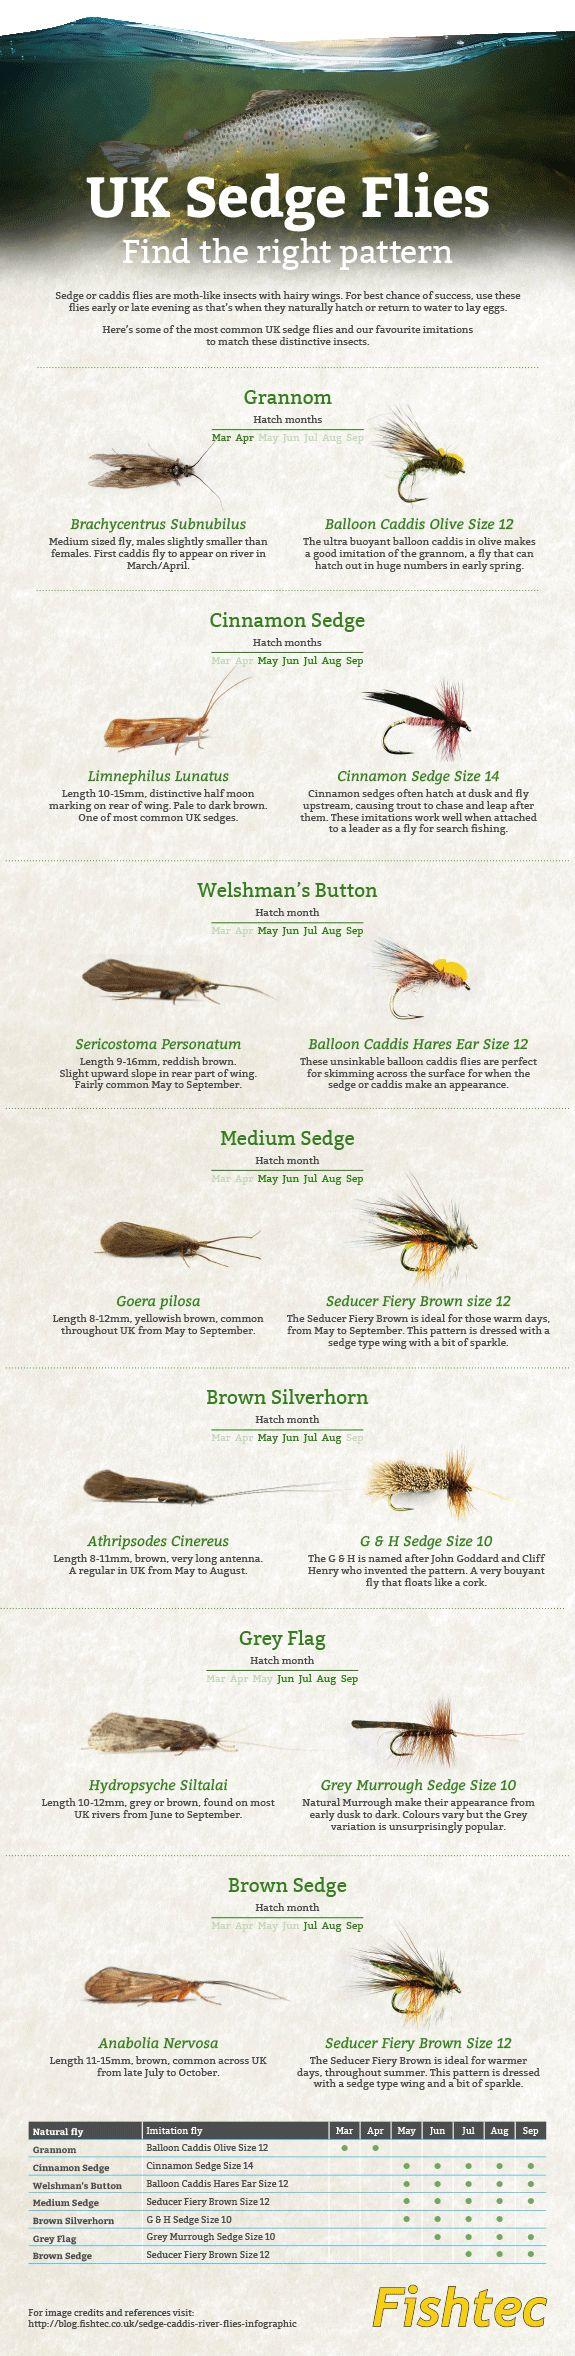 uk sedge and caddis fly fishing infographic